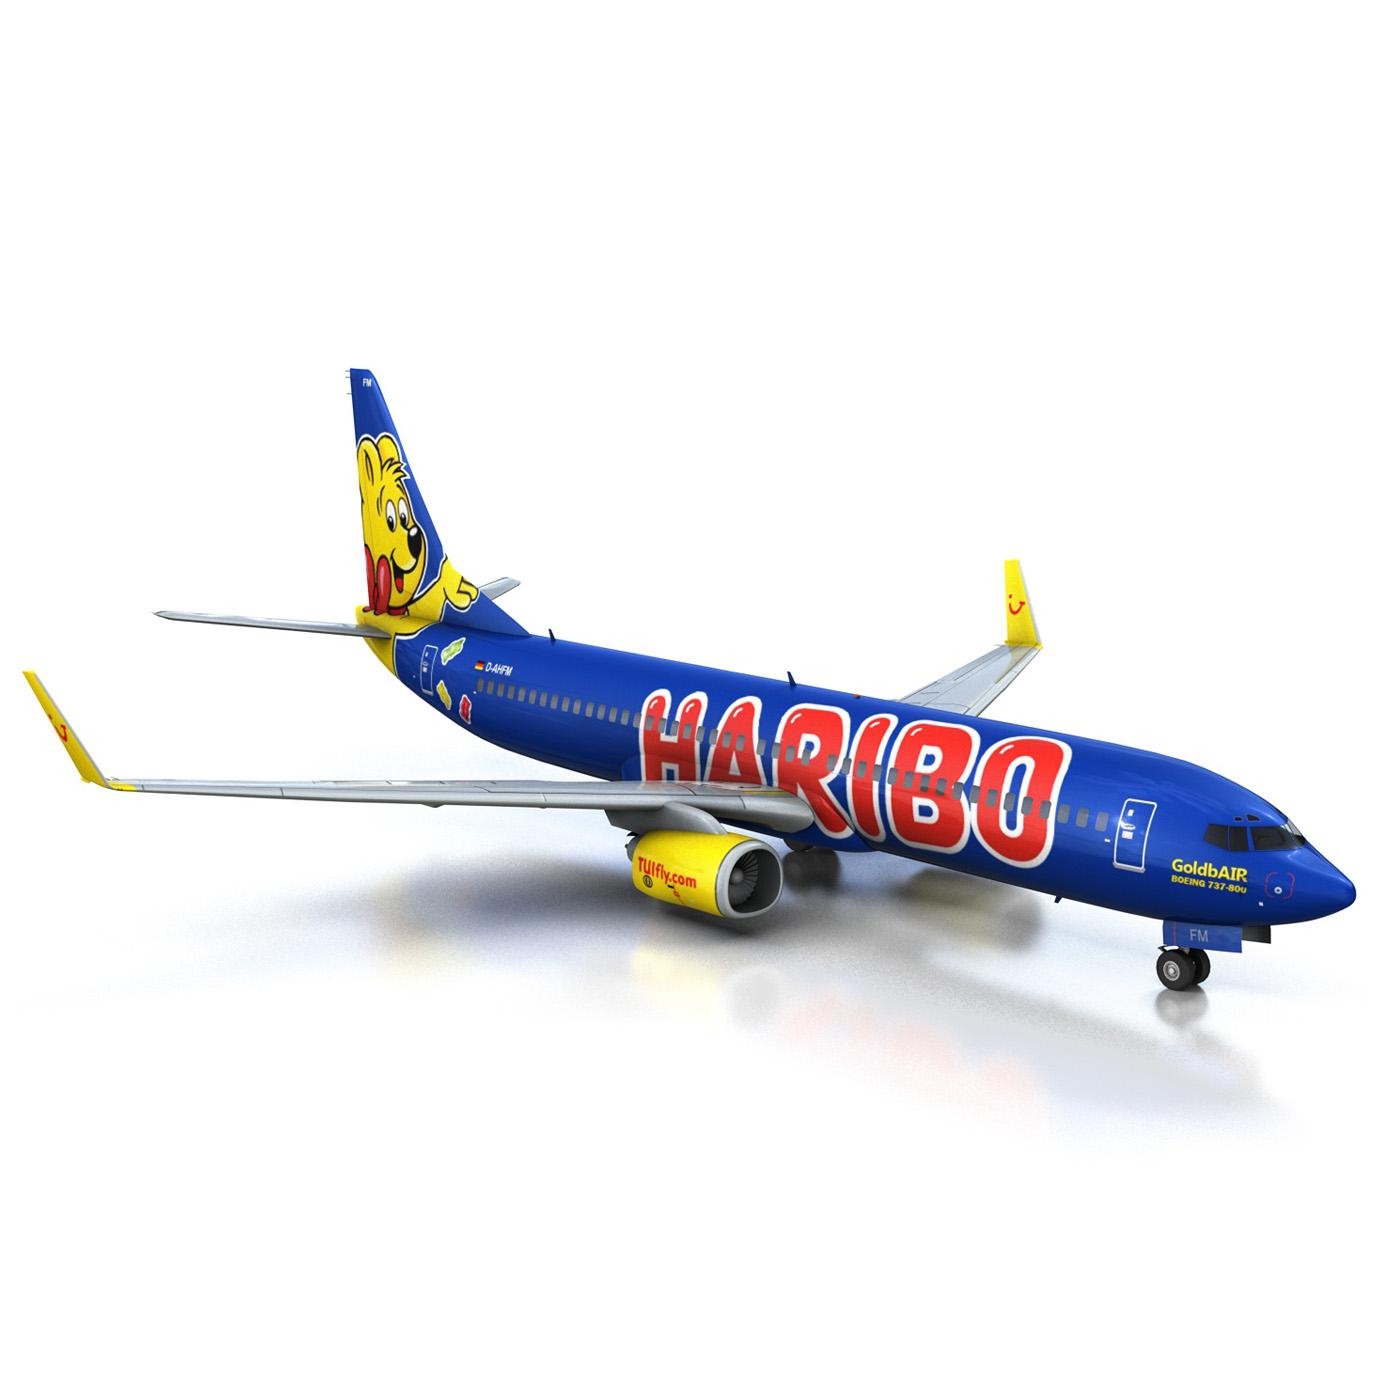 boeing 737-800 goldbair 3d model 3ds fbx c4d lwo obj 293499